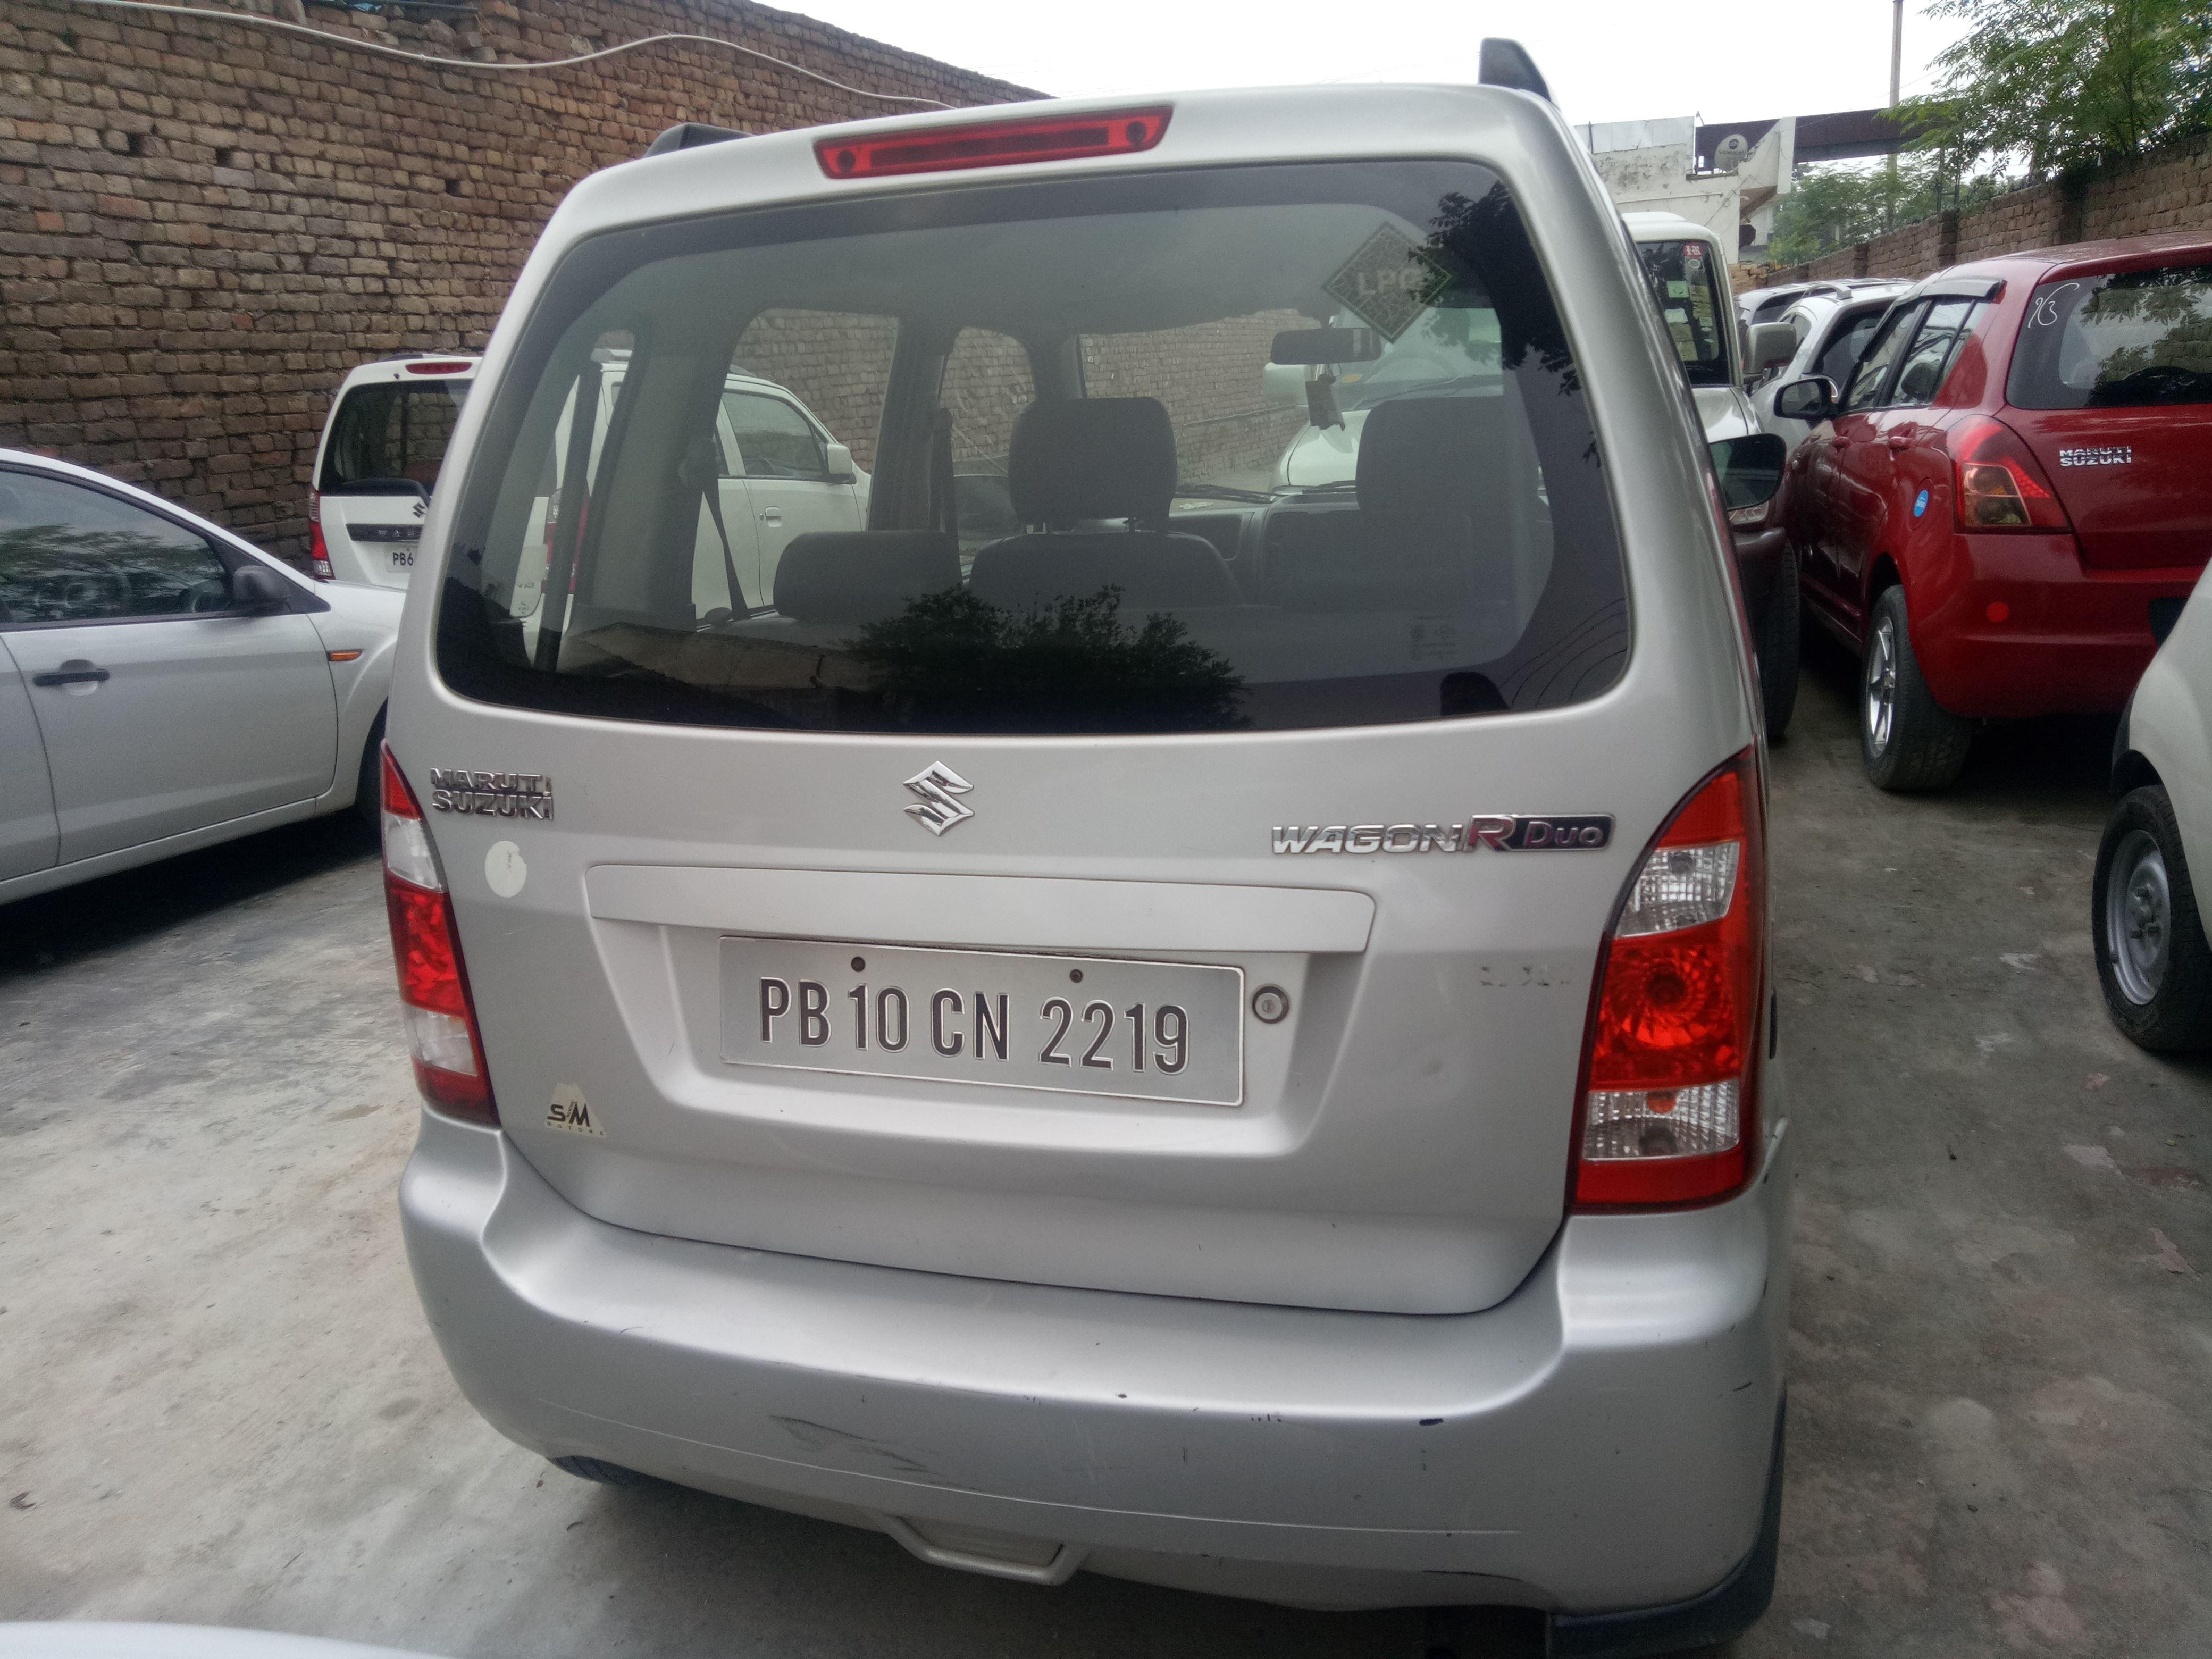 Maruti Suzuki Wagon R Duo Lxi Lpg Mahindra First Choice